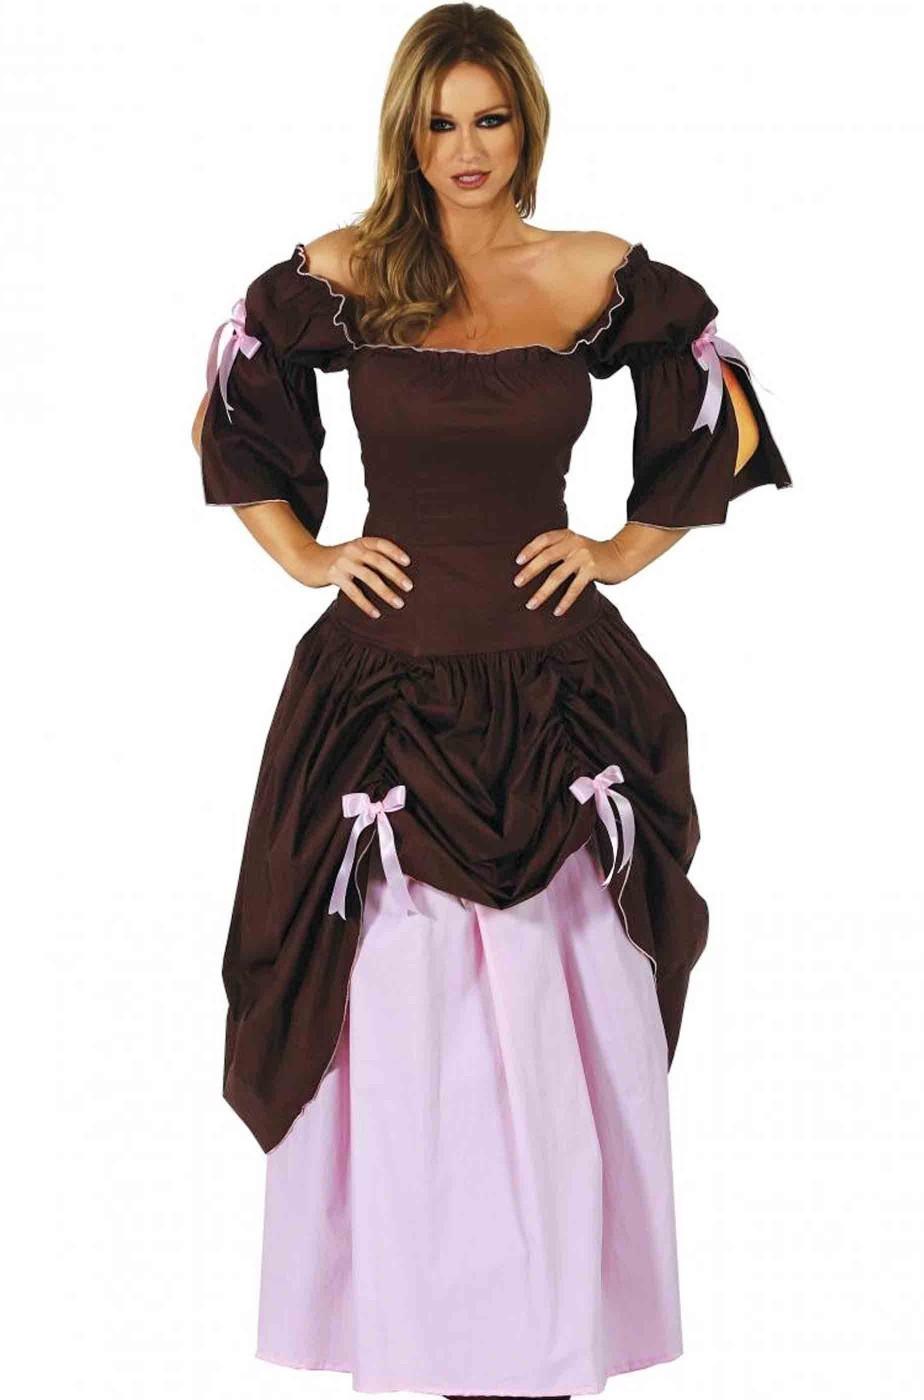 Costume donna dama 700 rinascimentale adulta